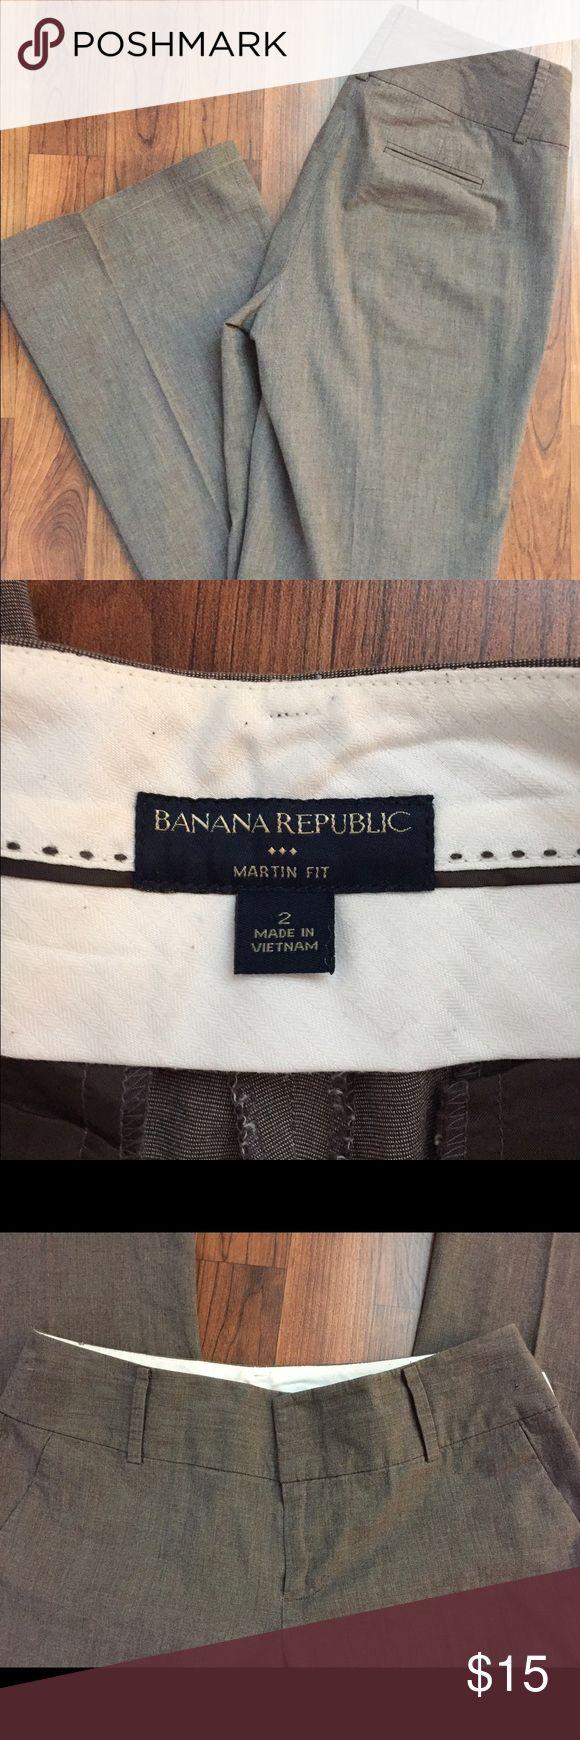 "Banana Republic Slacks Banana Republic ""Martin Fit"" light gray slacks! Perfect for office wear! Size: 2 Measurements: W15"", L 30"" Cotton, Spandex Banana Republic Pants Trousers"